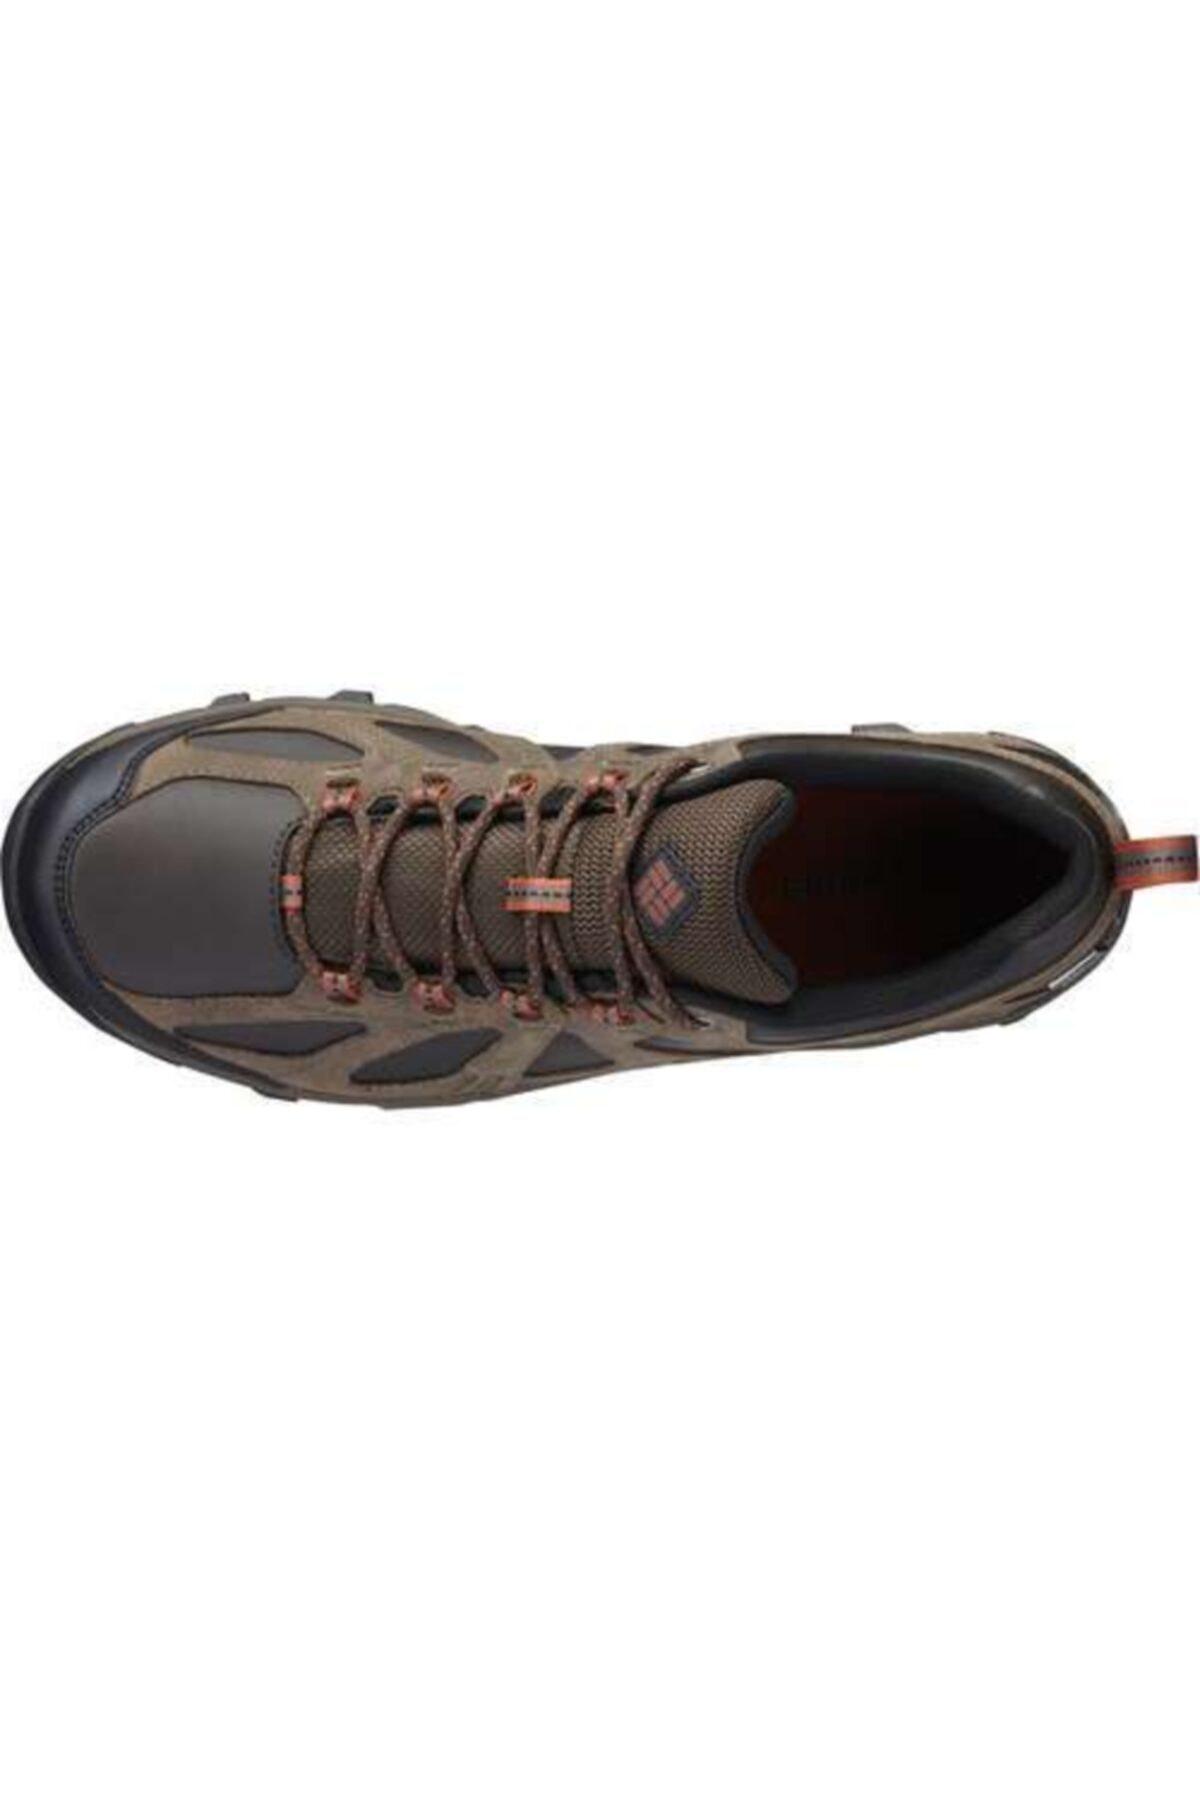 Columbia Erkek Kahverengi Outdoor Ayakkabı Bm1759-231 2